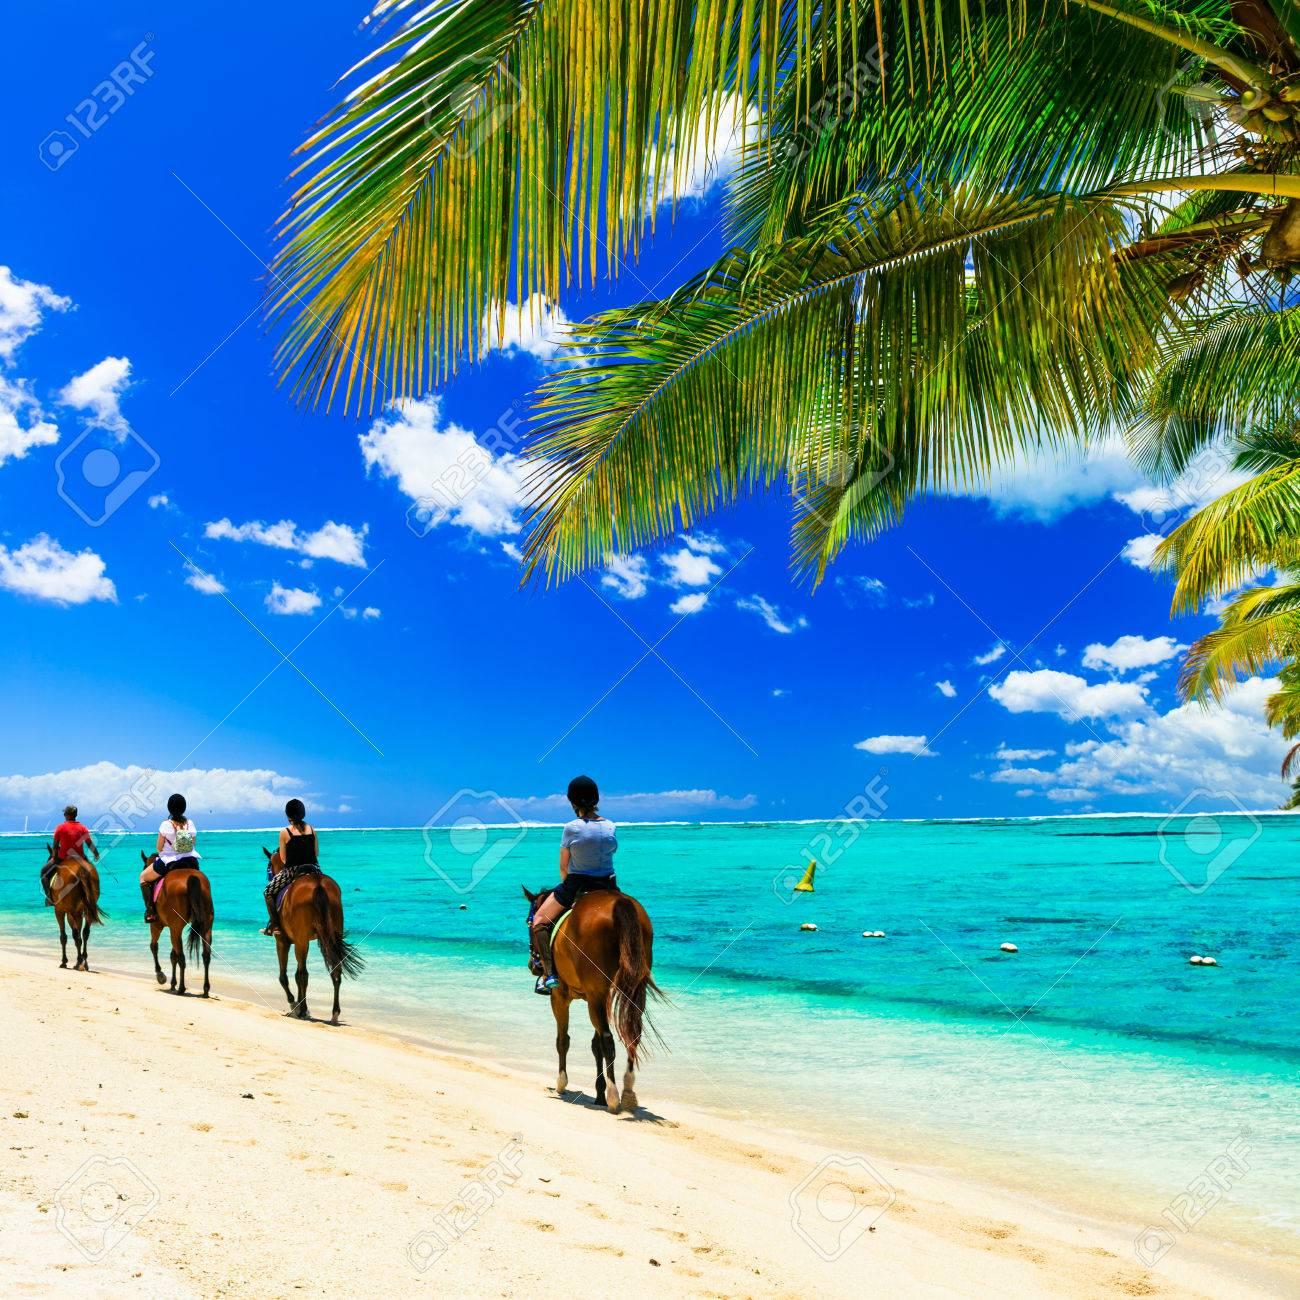 Panoramic view of beautiful beach, azure sea palm tree and horses, Mauritius island. - 82069277